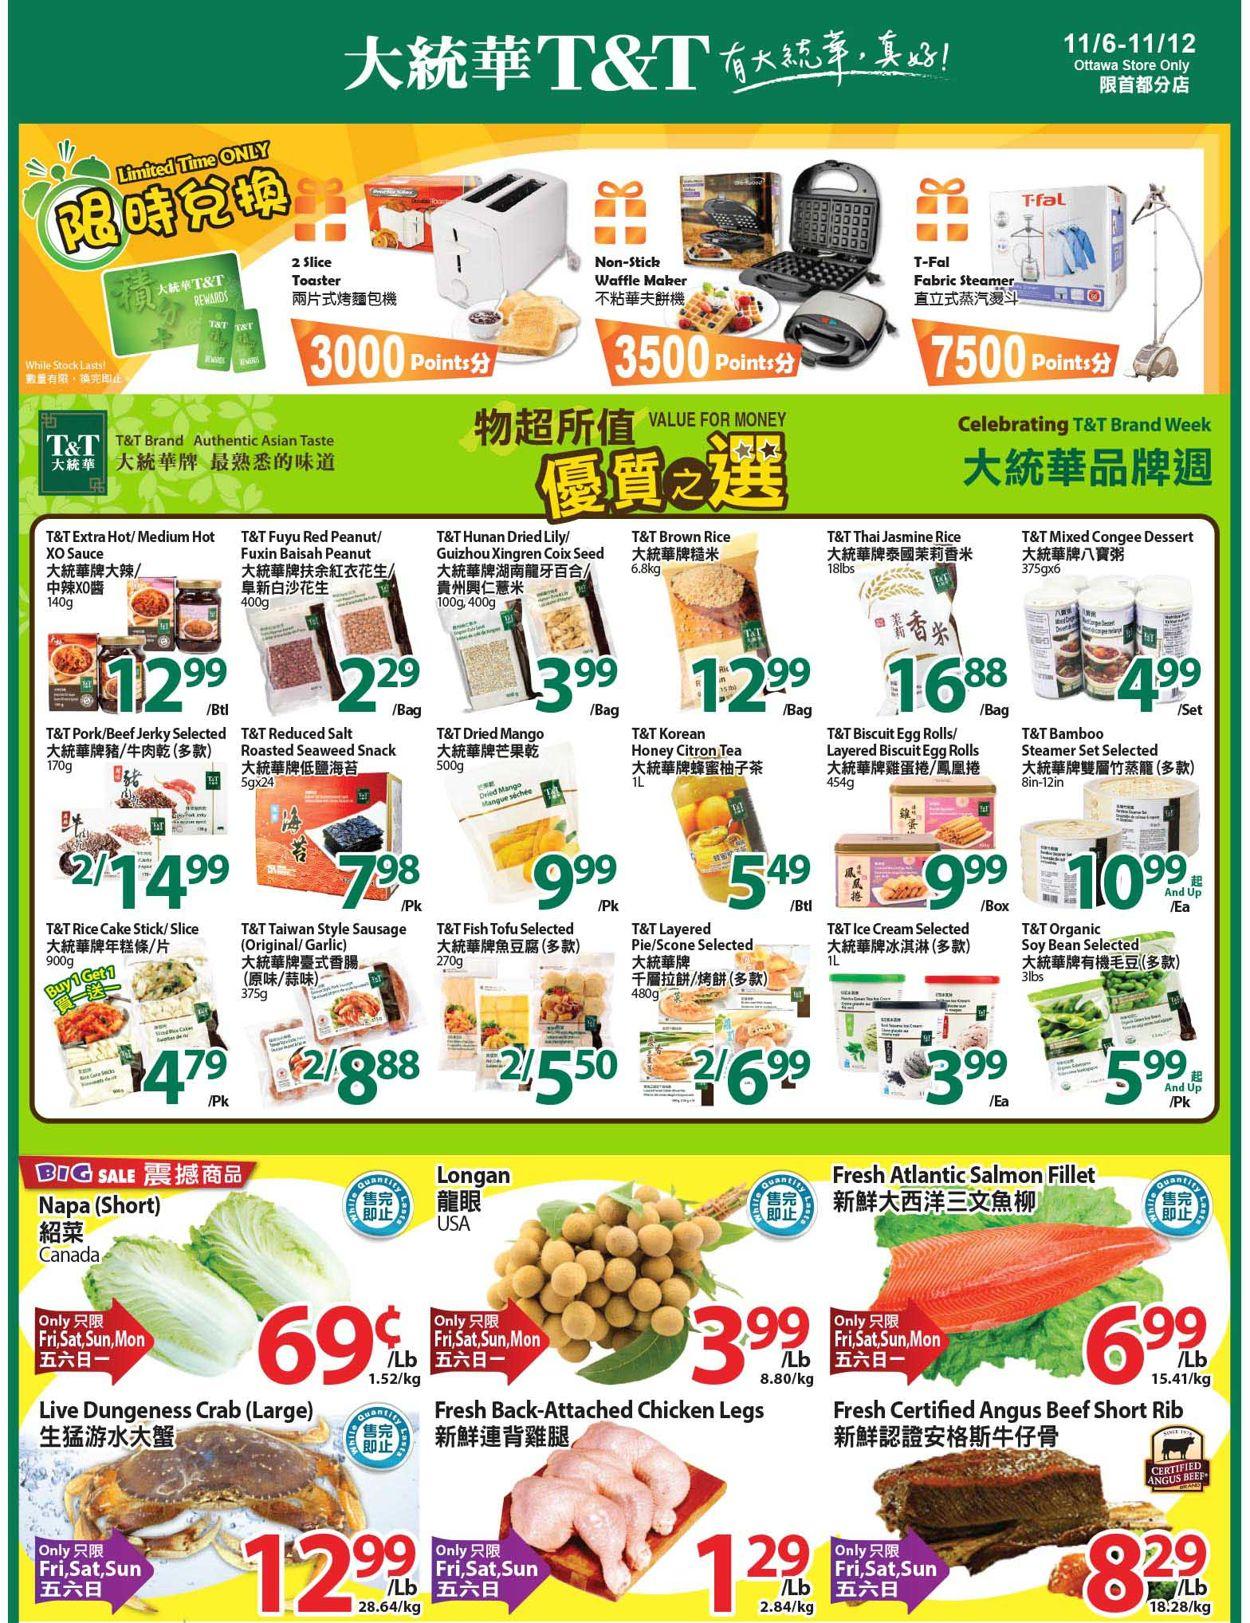 T&T Supermarket - Ottawa Flyer - 11/06-11/12/2020